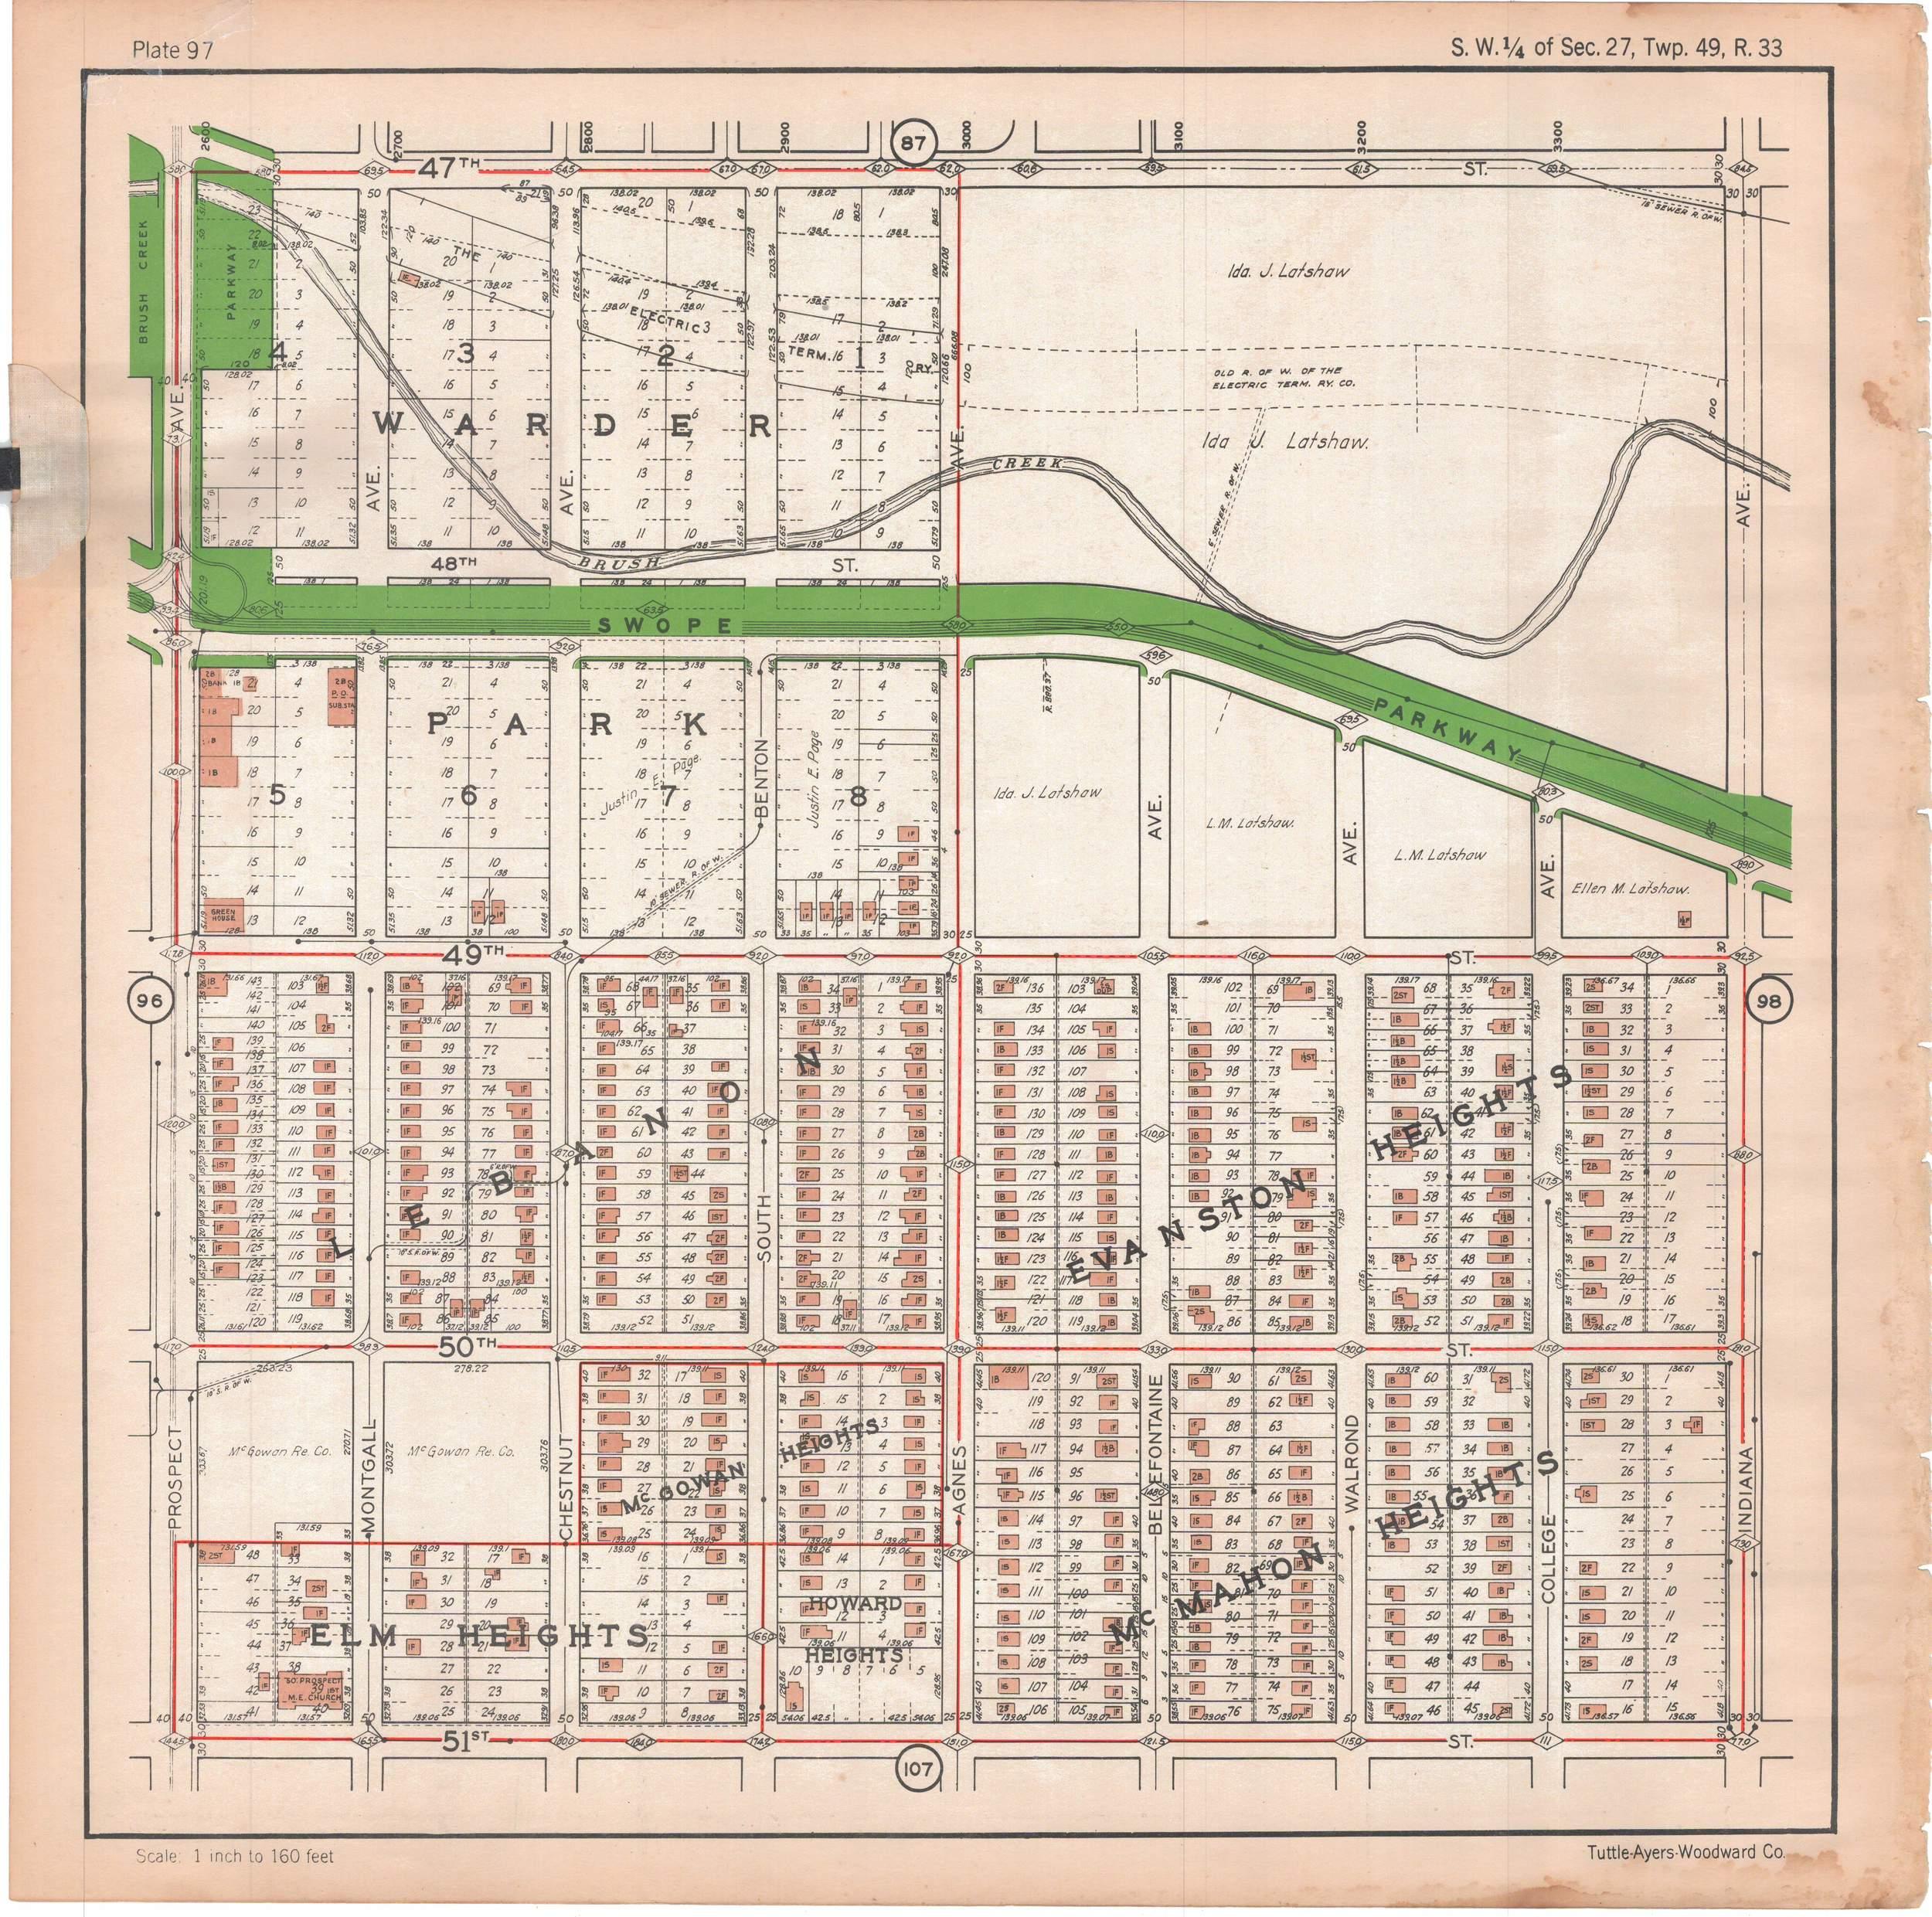 1925 TUTTLE_AYERS_Plate 97.JPG